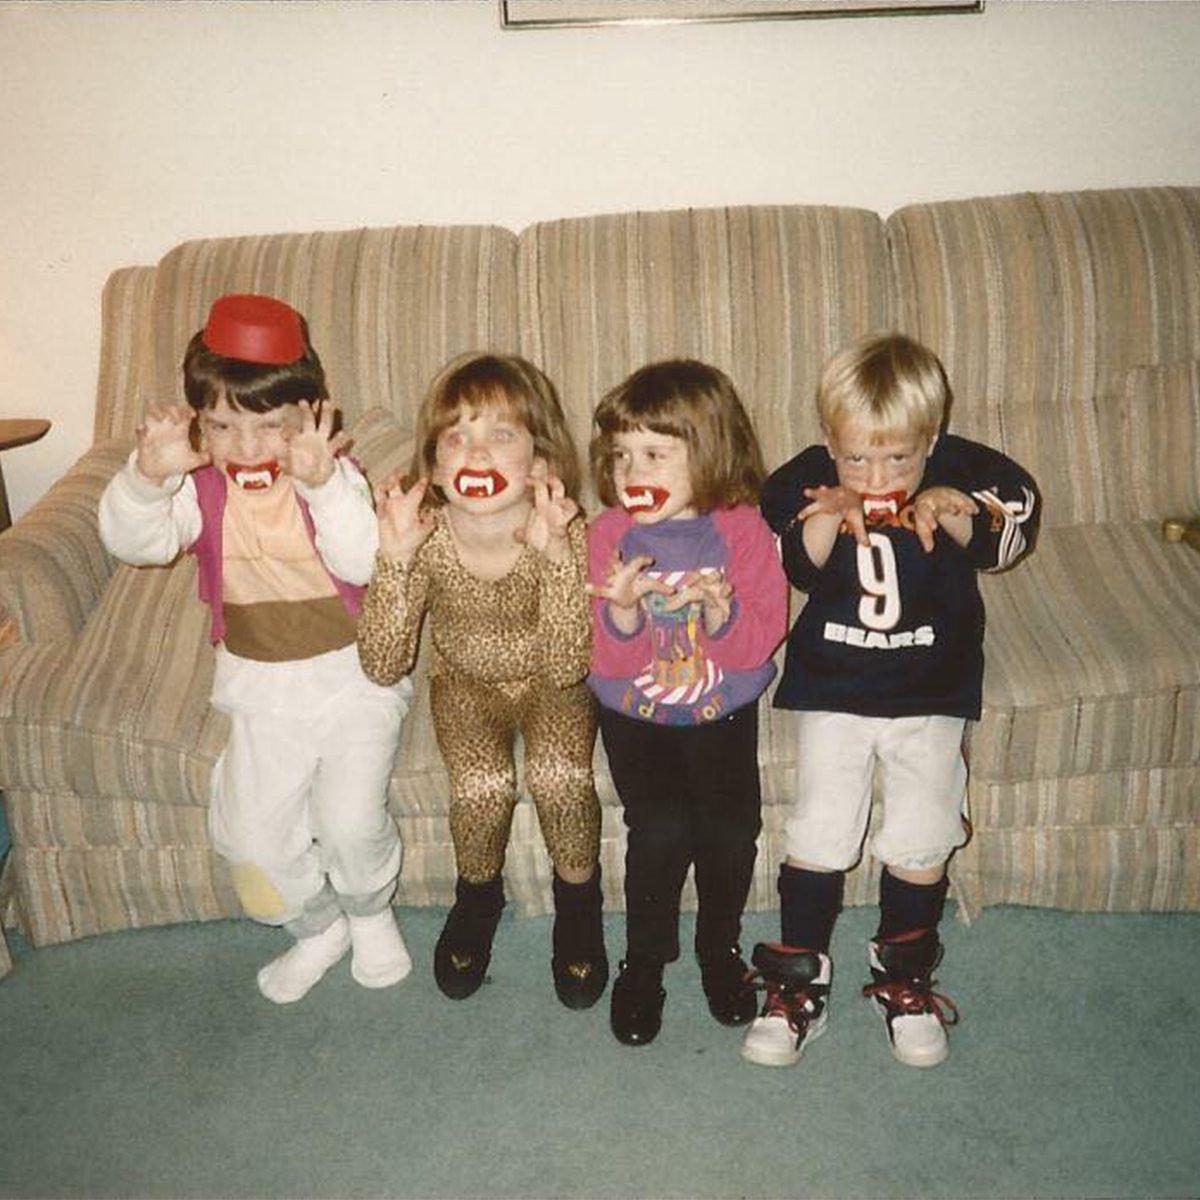 four children dressed in Halloween costumes